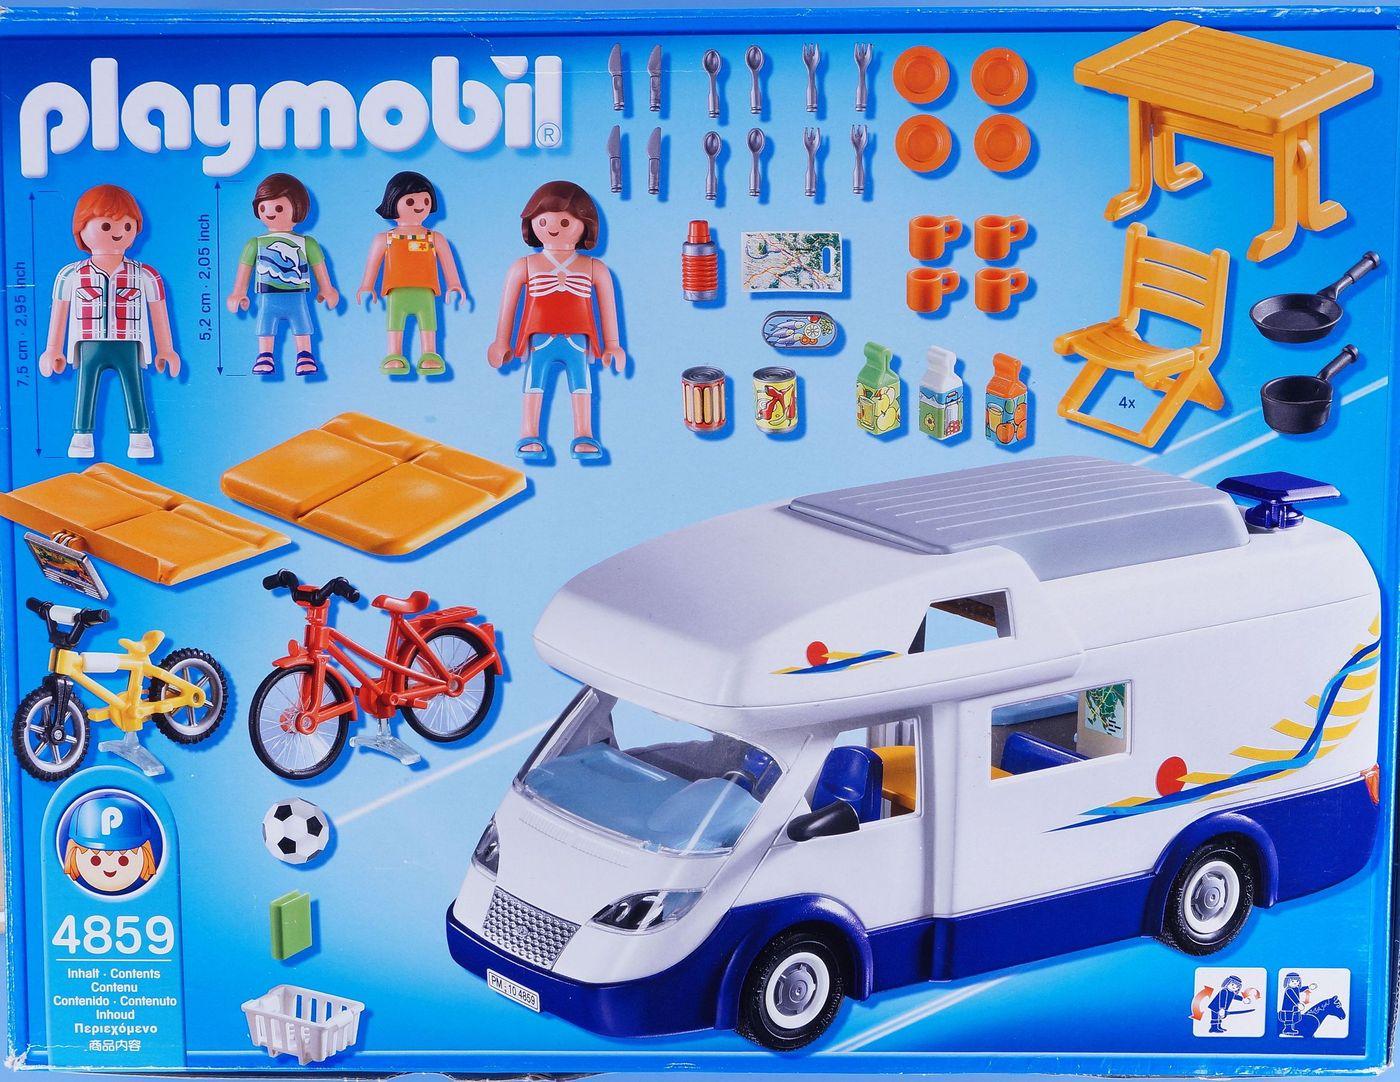 playmobil camper van caravan camping figures accessories boxed holiday 4859 ebay. Black Bedroom Furniture Sets. Home Design Ideas